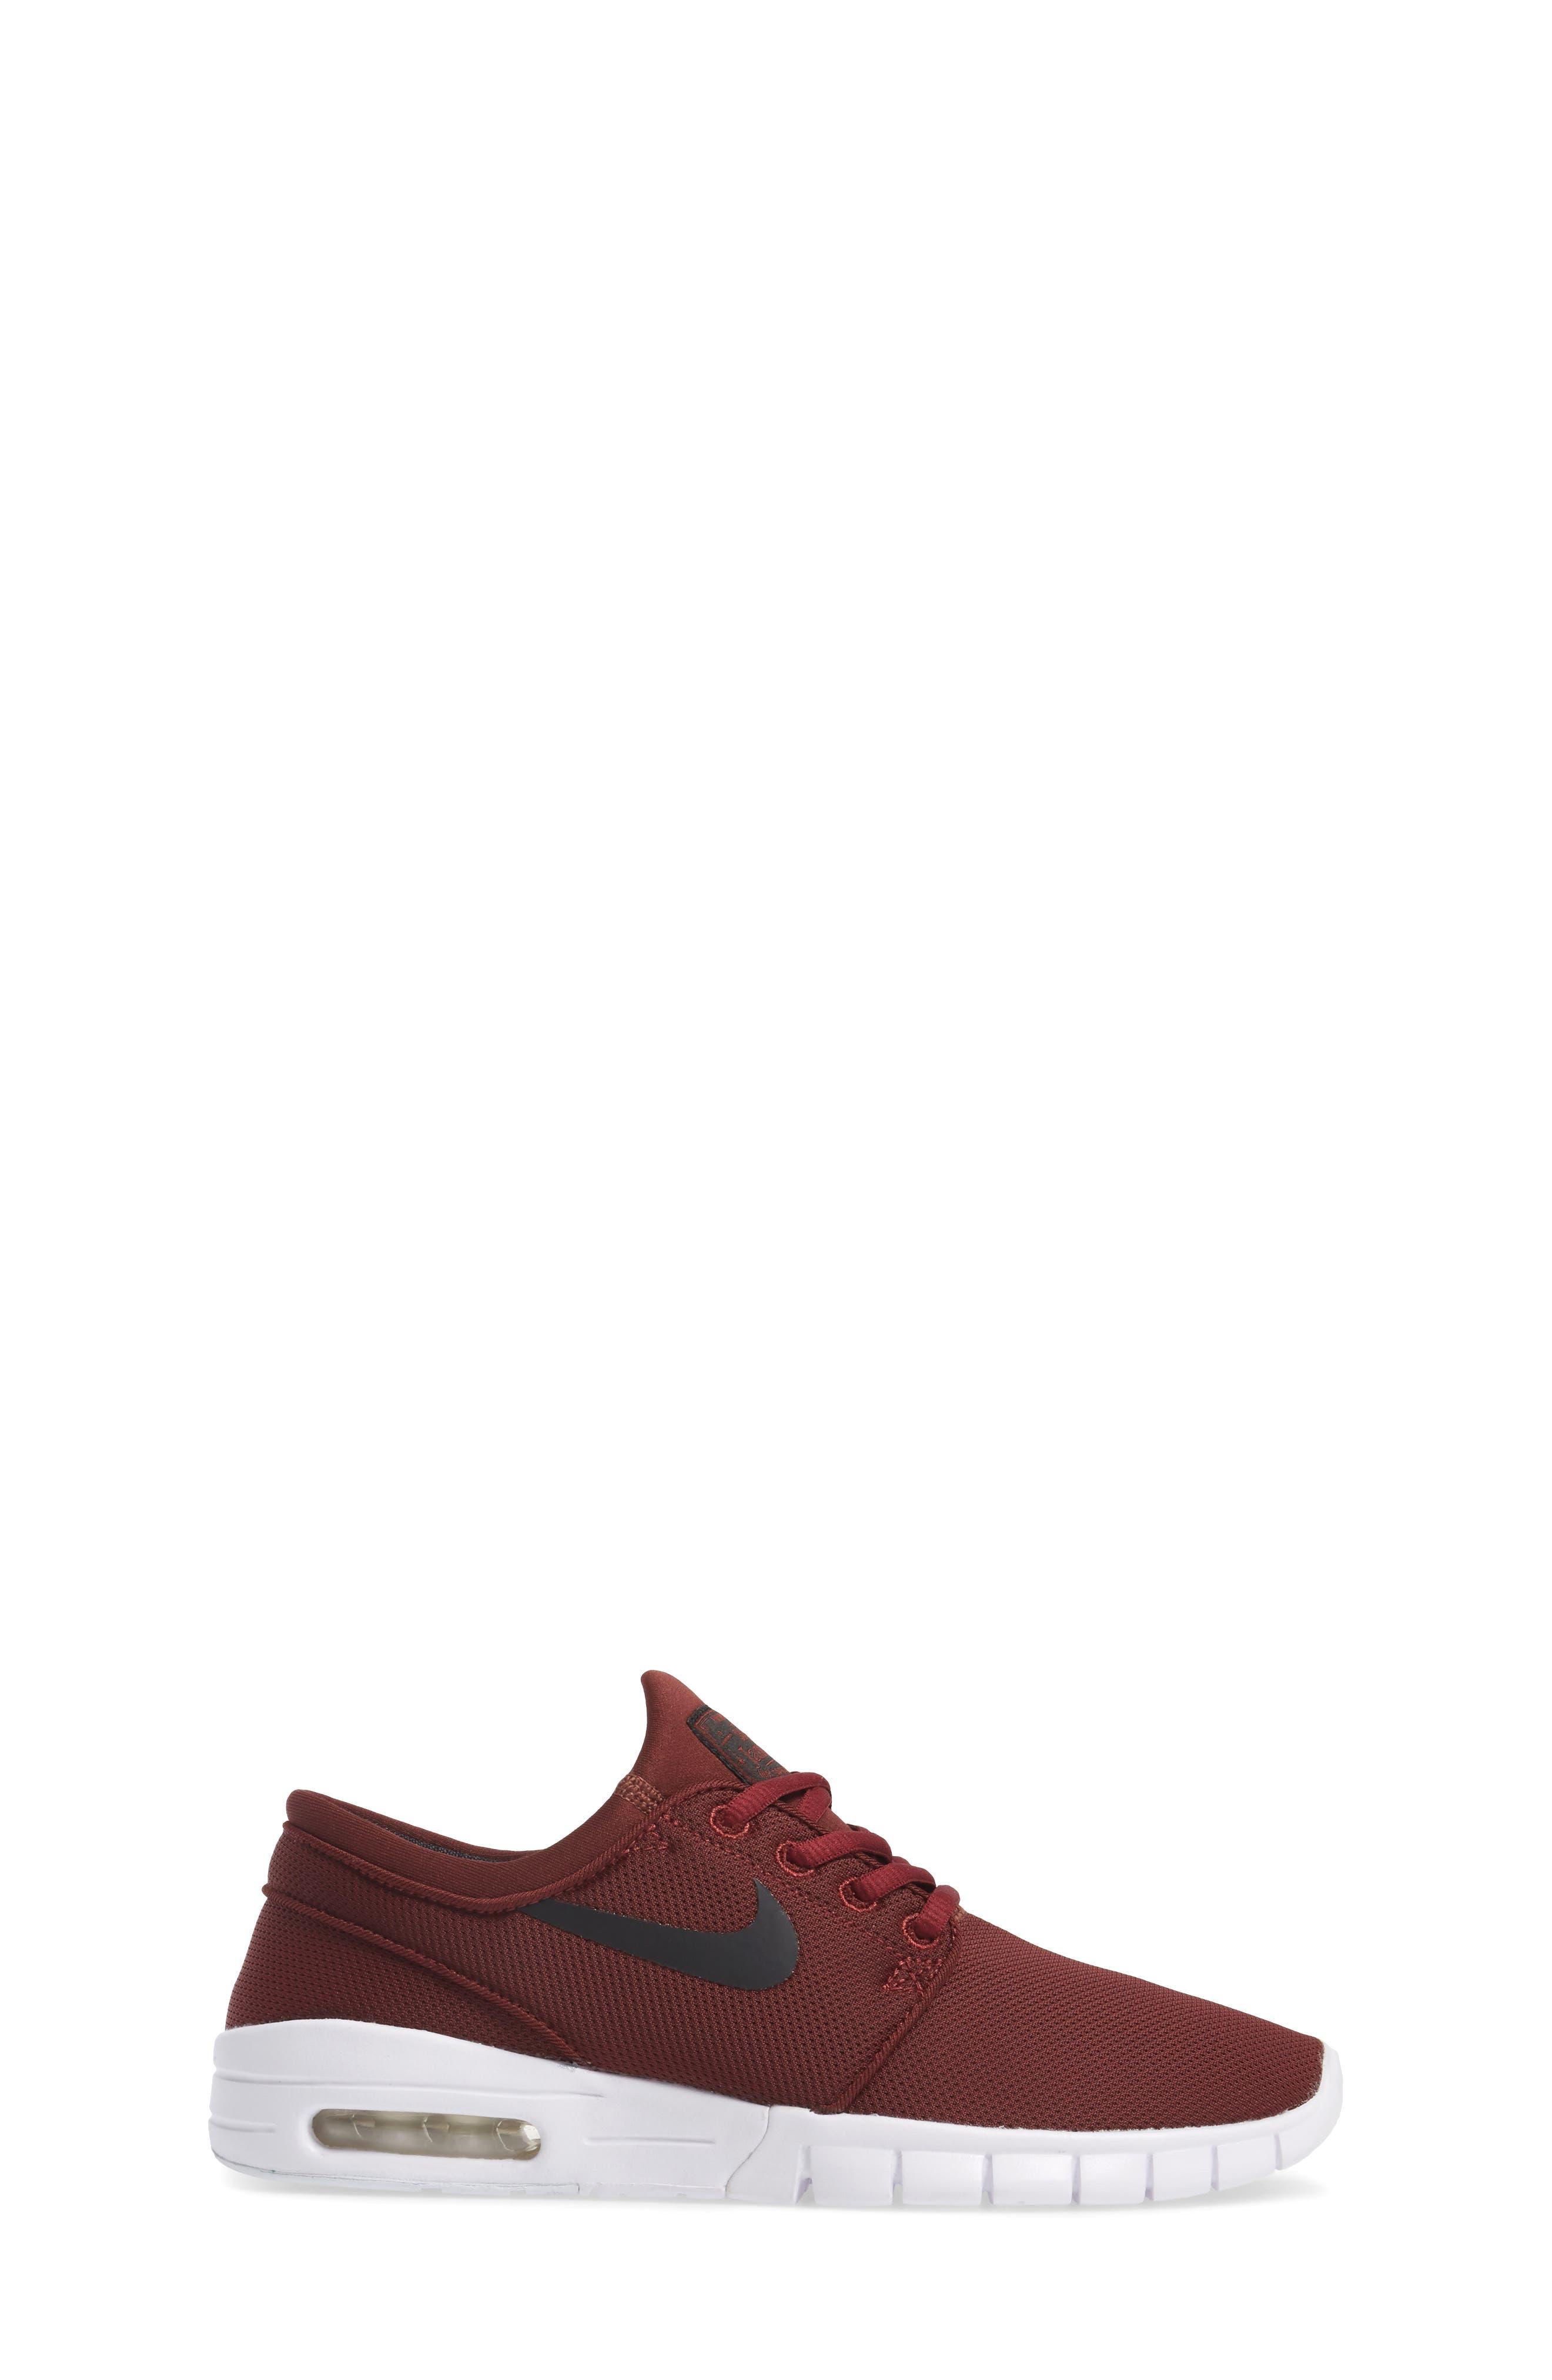 Stefan Janoski Max SB Skate Sneaker,                             Alternate thumbnail 27, color,